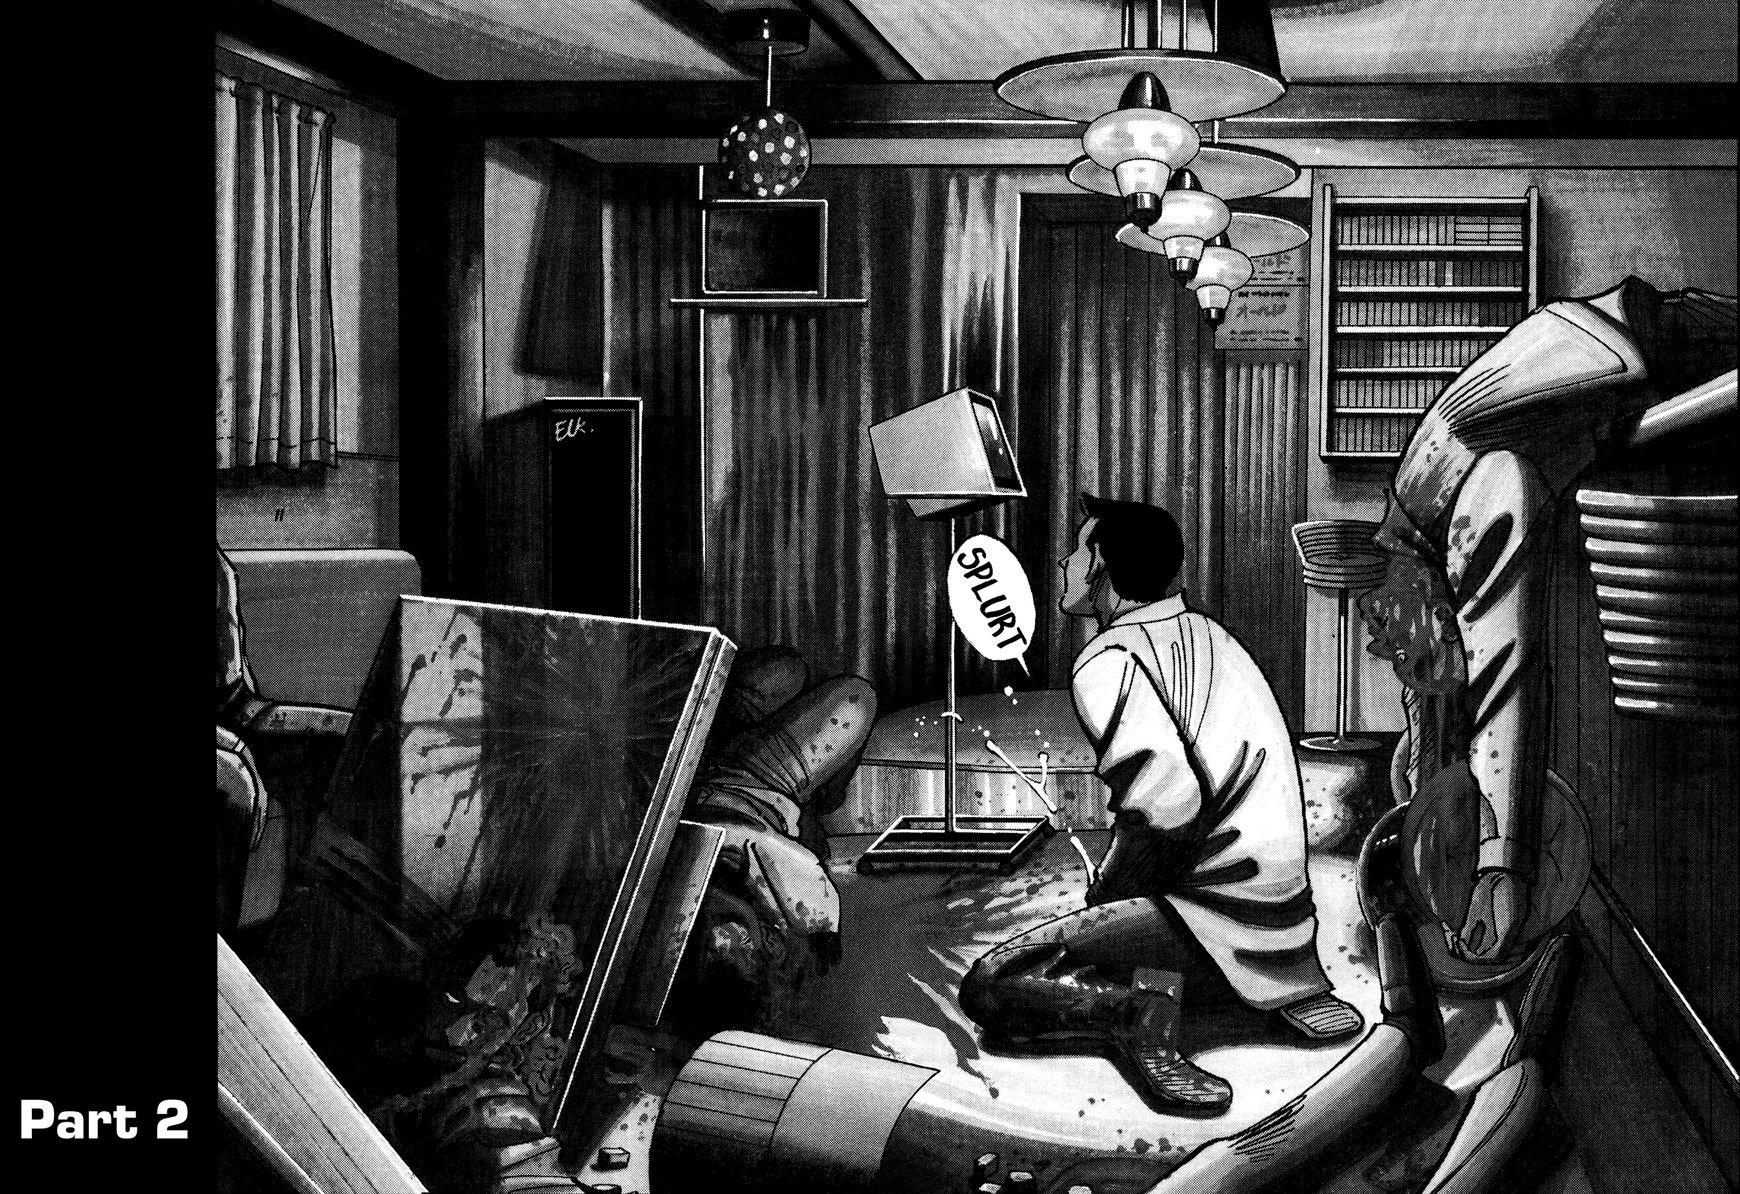 Ichi (YAMAMOTO Hideo) 11.2 Page 2